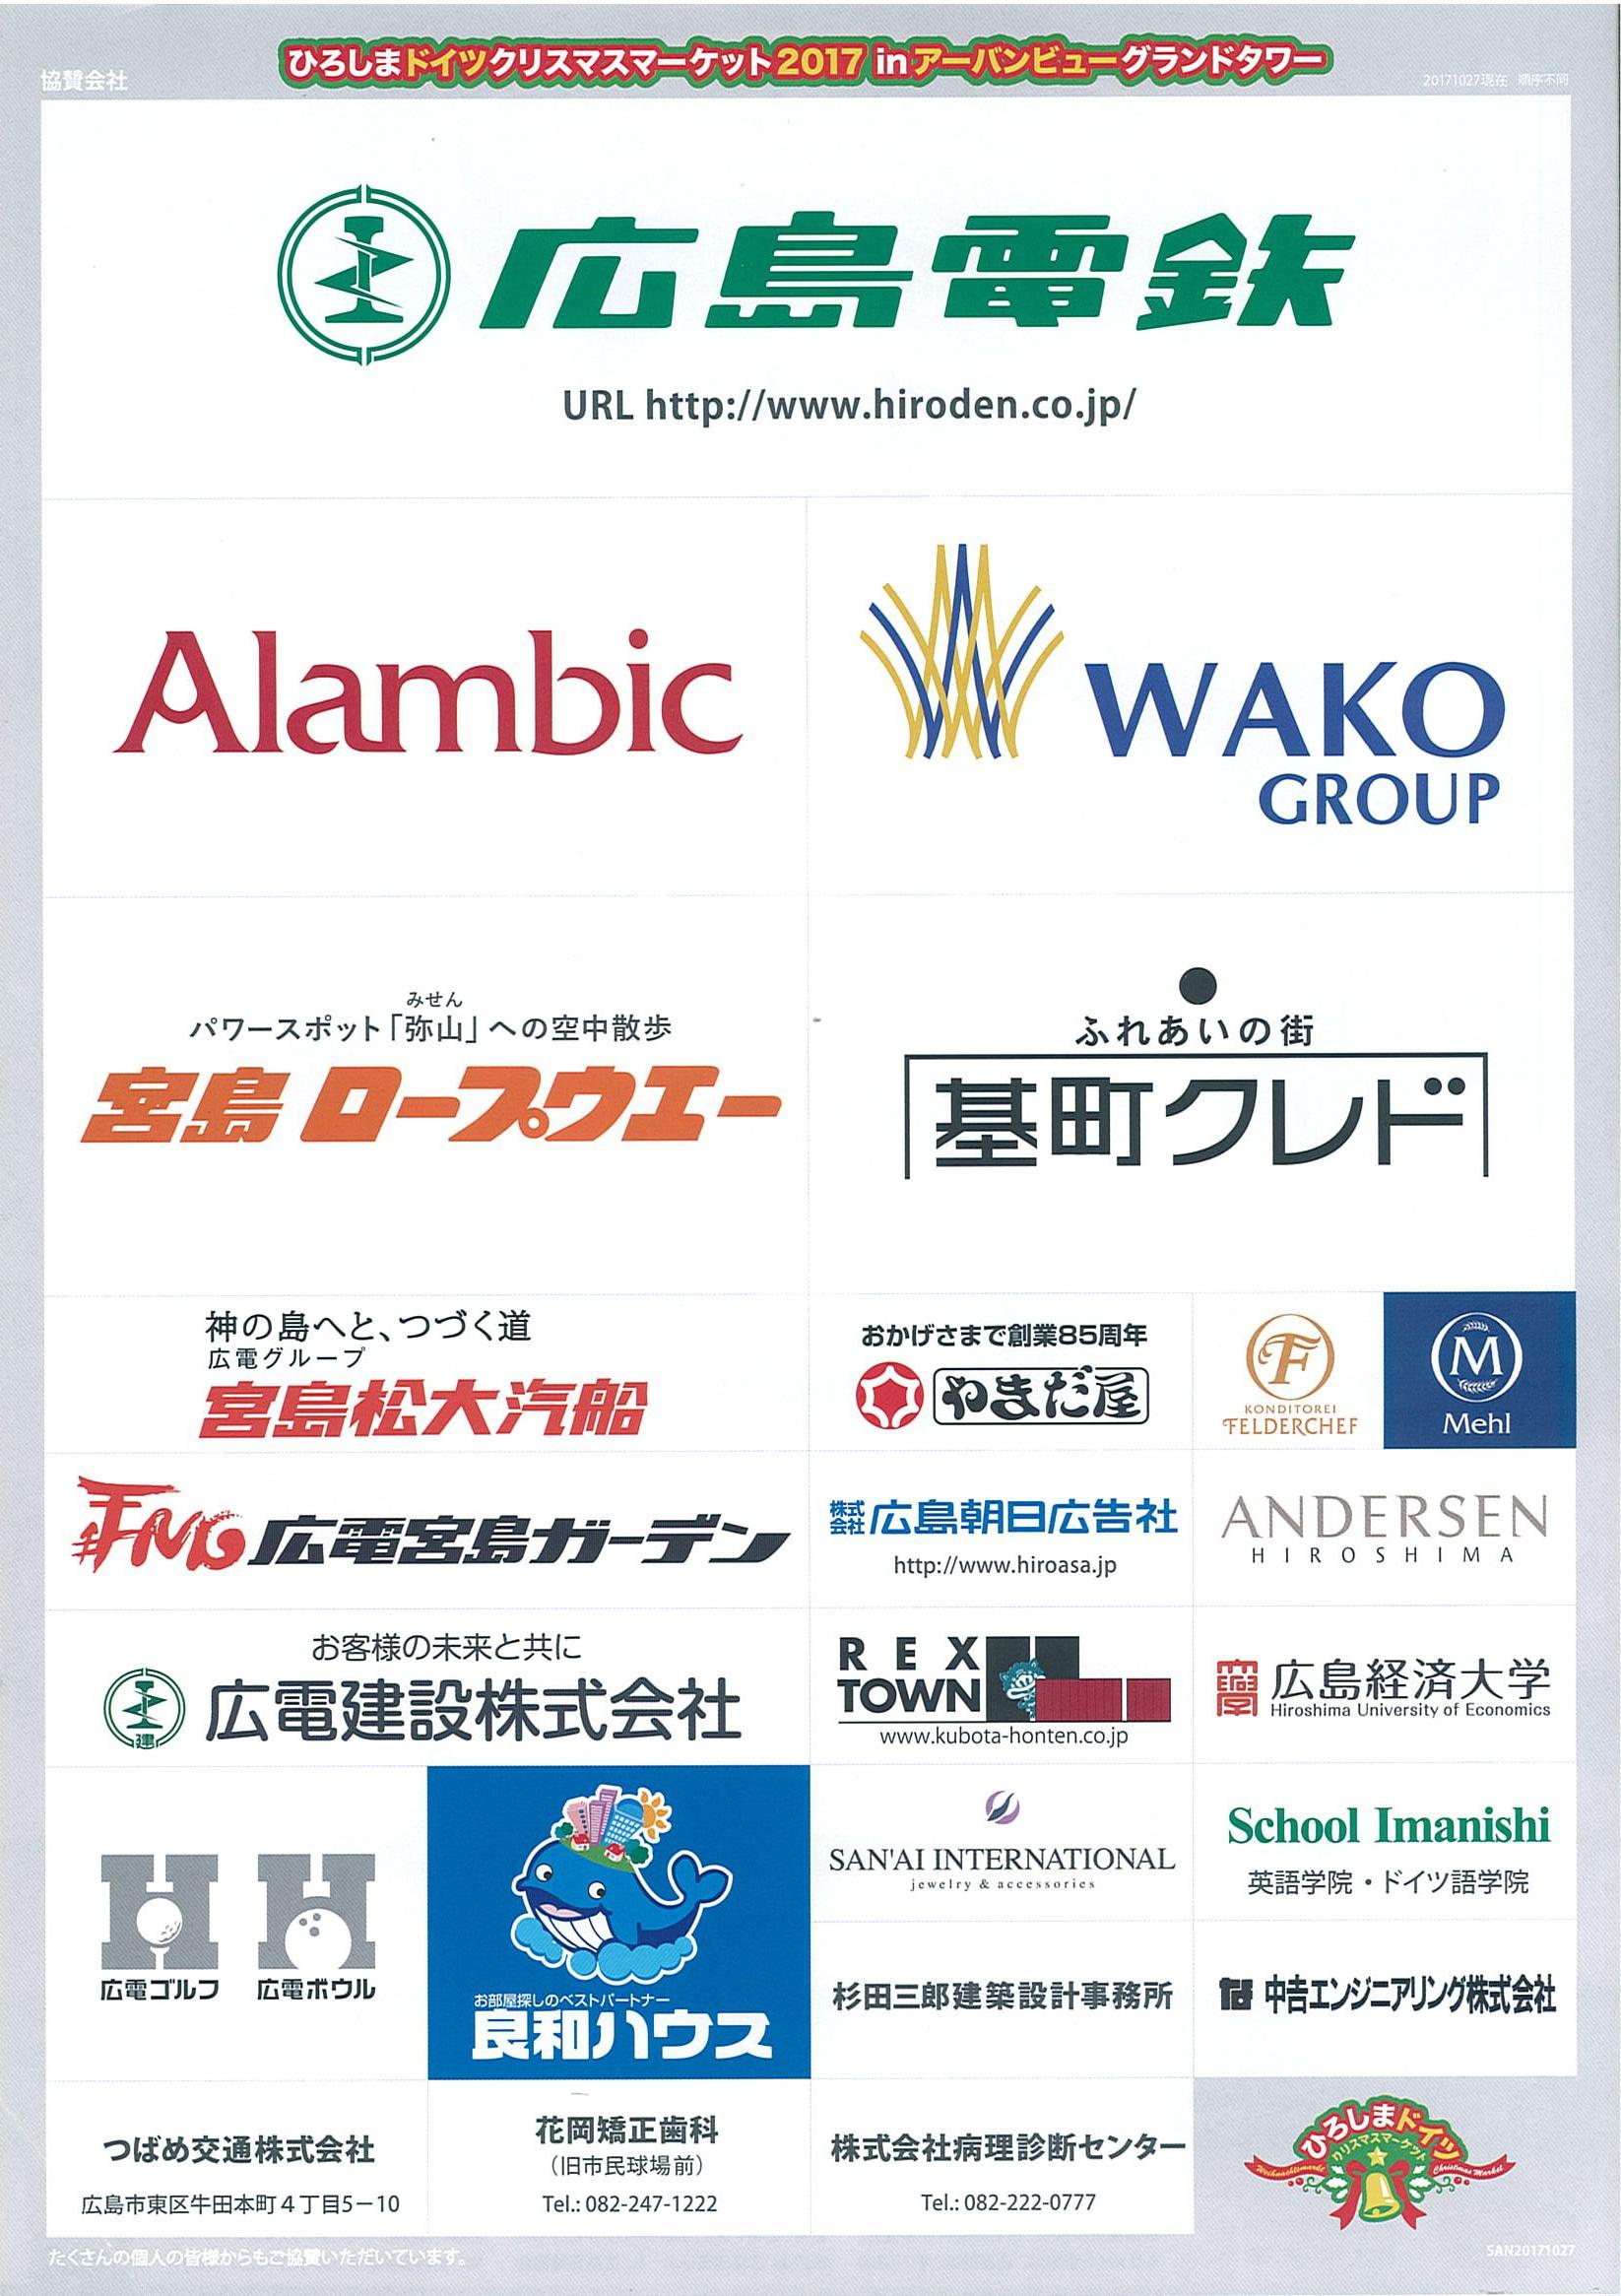 http://wako-est.jp/blog/images/Xmas2017GT-2.jpg